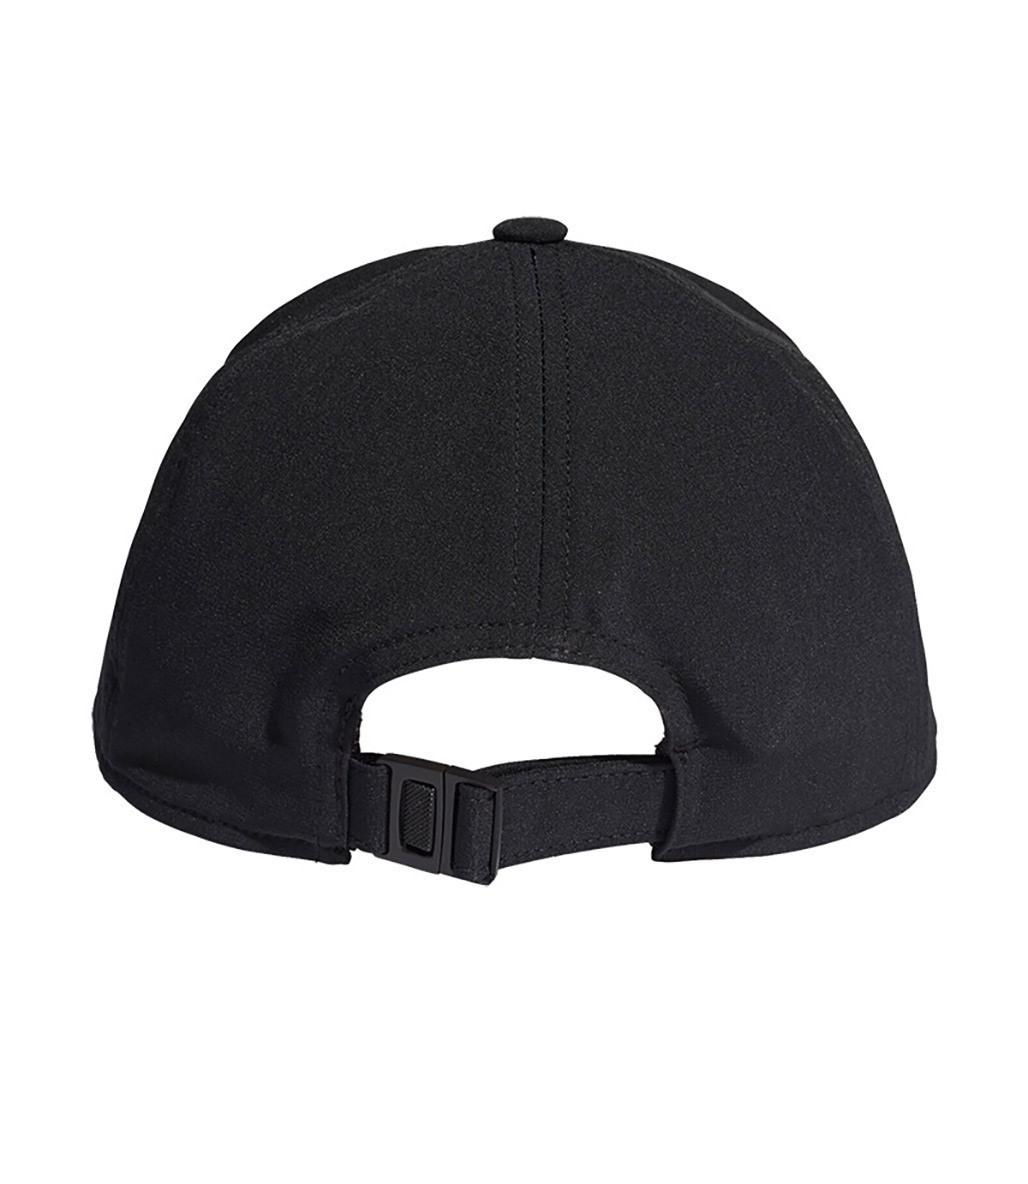 Adidas Aeroready Baseball Cap Şapka Siyah